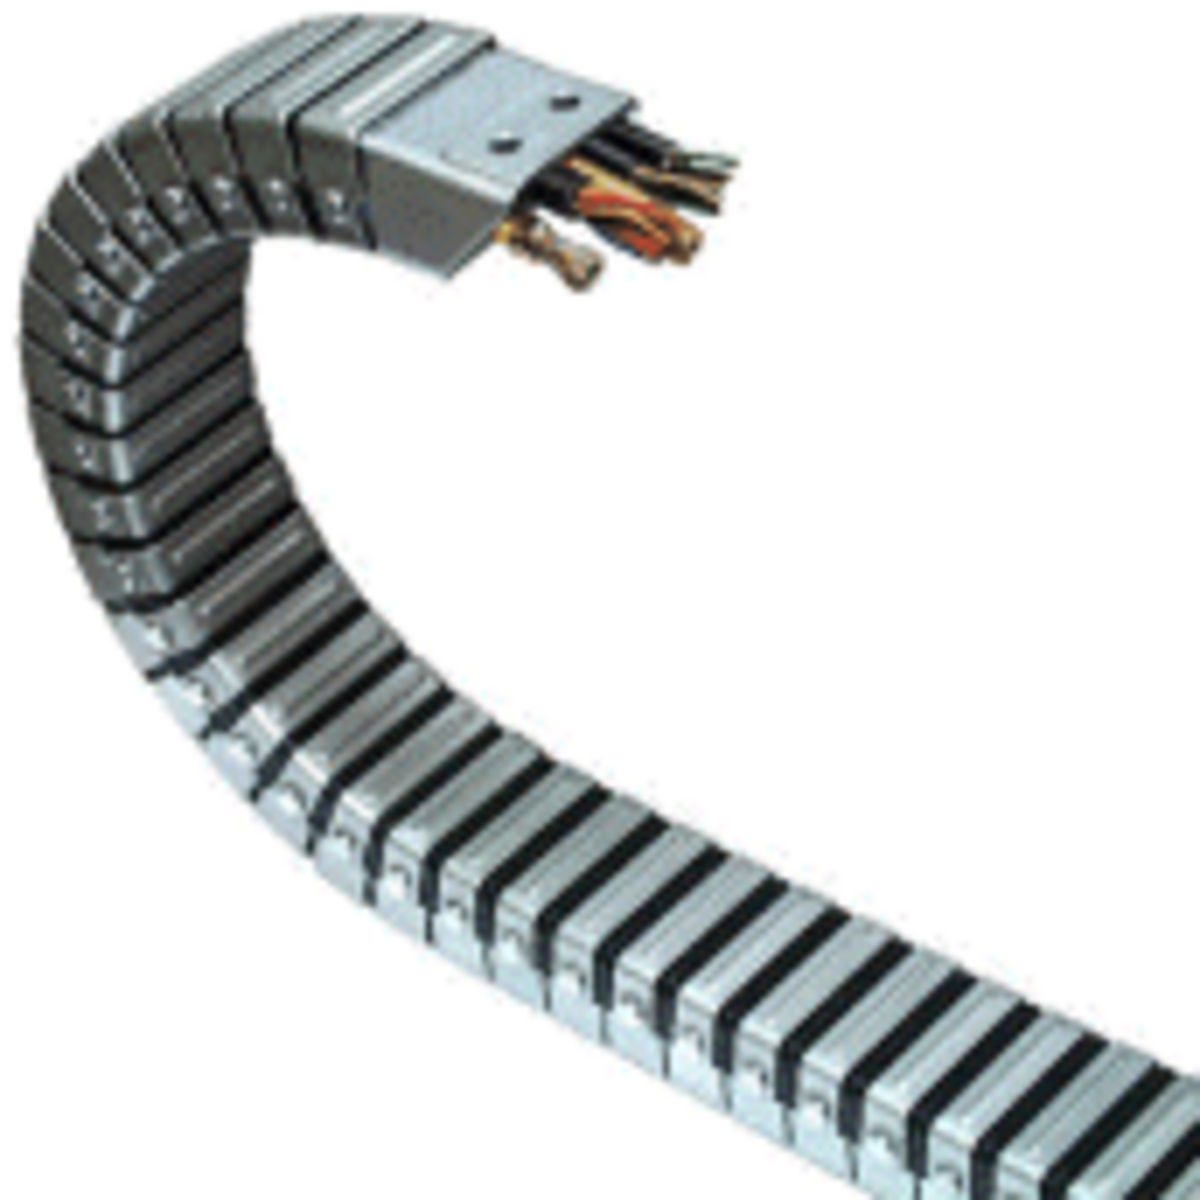 Gleason Cable Track : Brand gleason reel